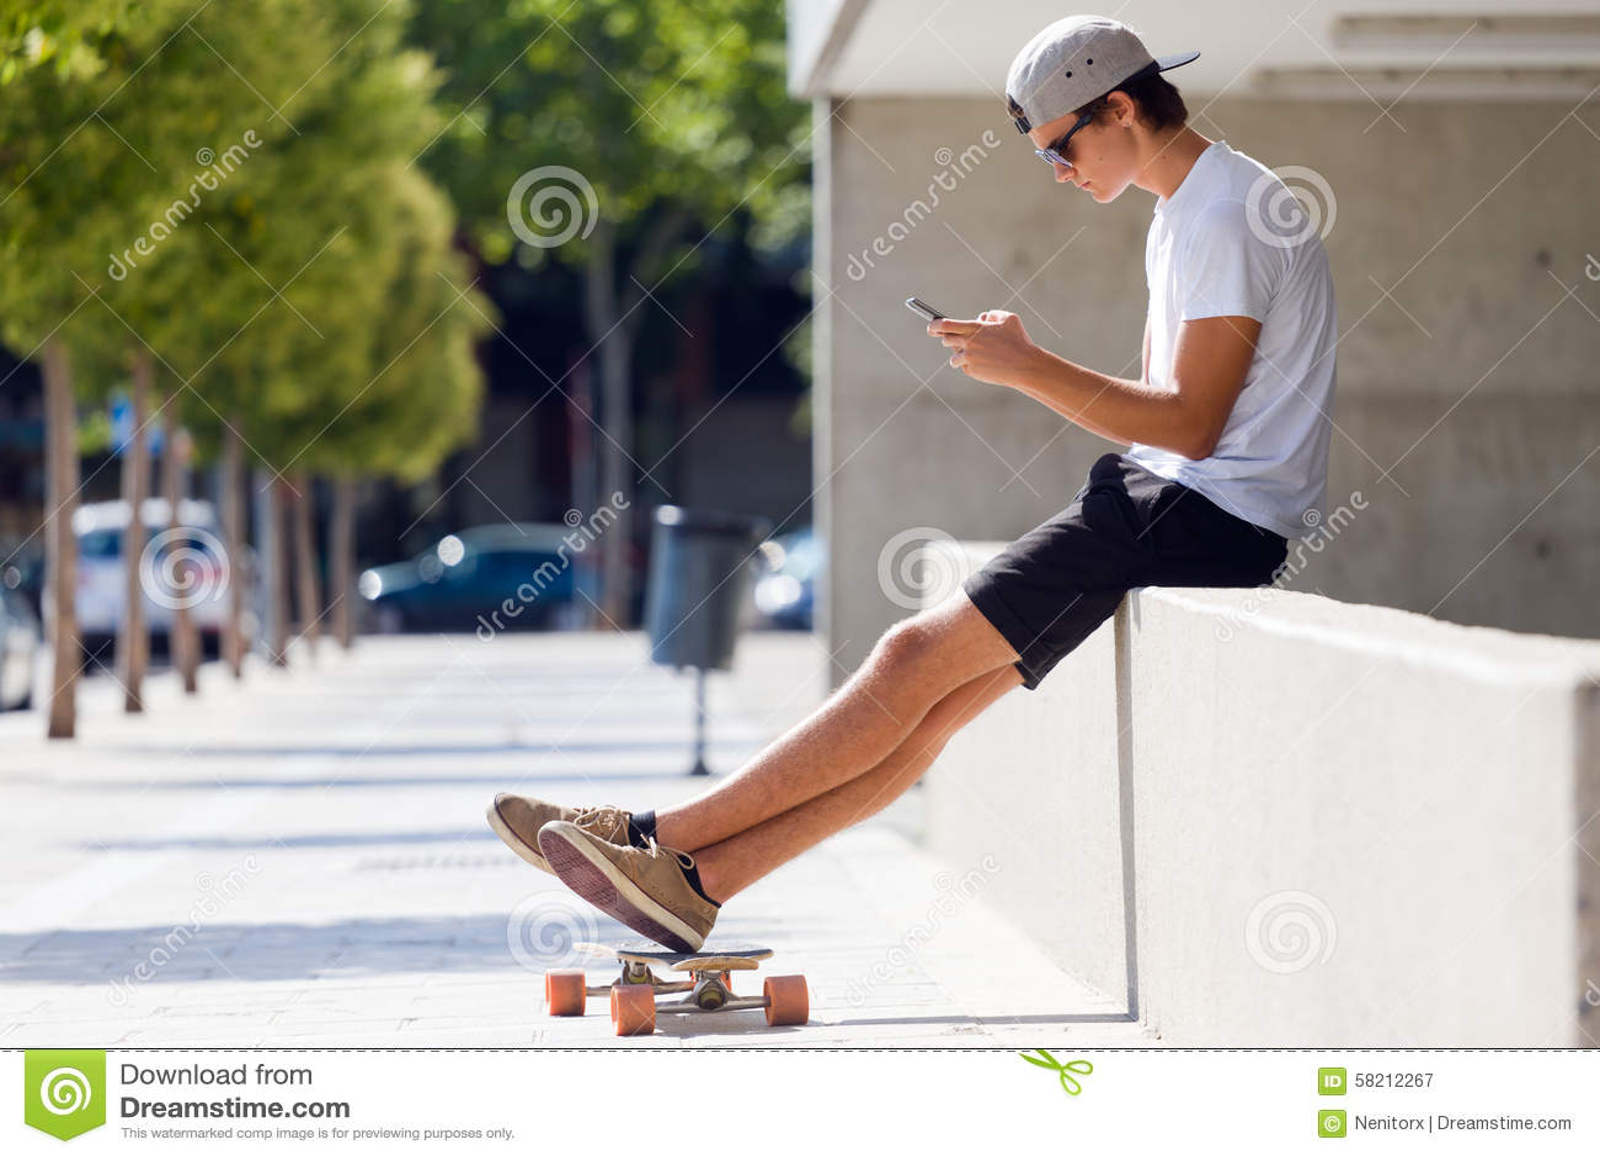 Handsome skater boy using his mobile phone in the street - Skateboard mobel ...